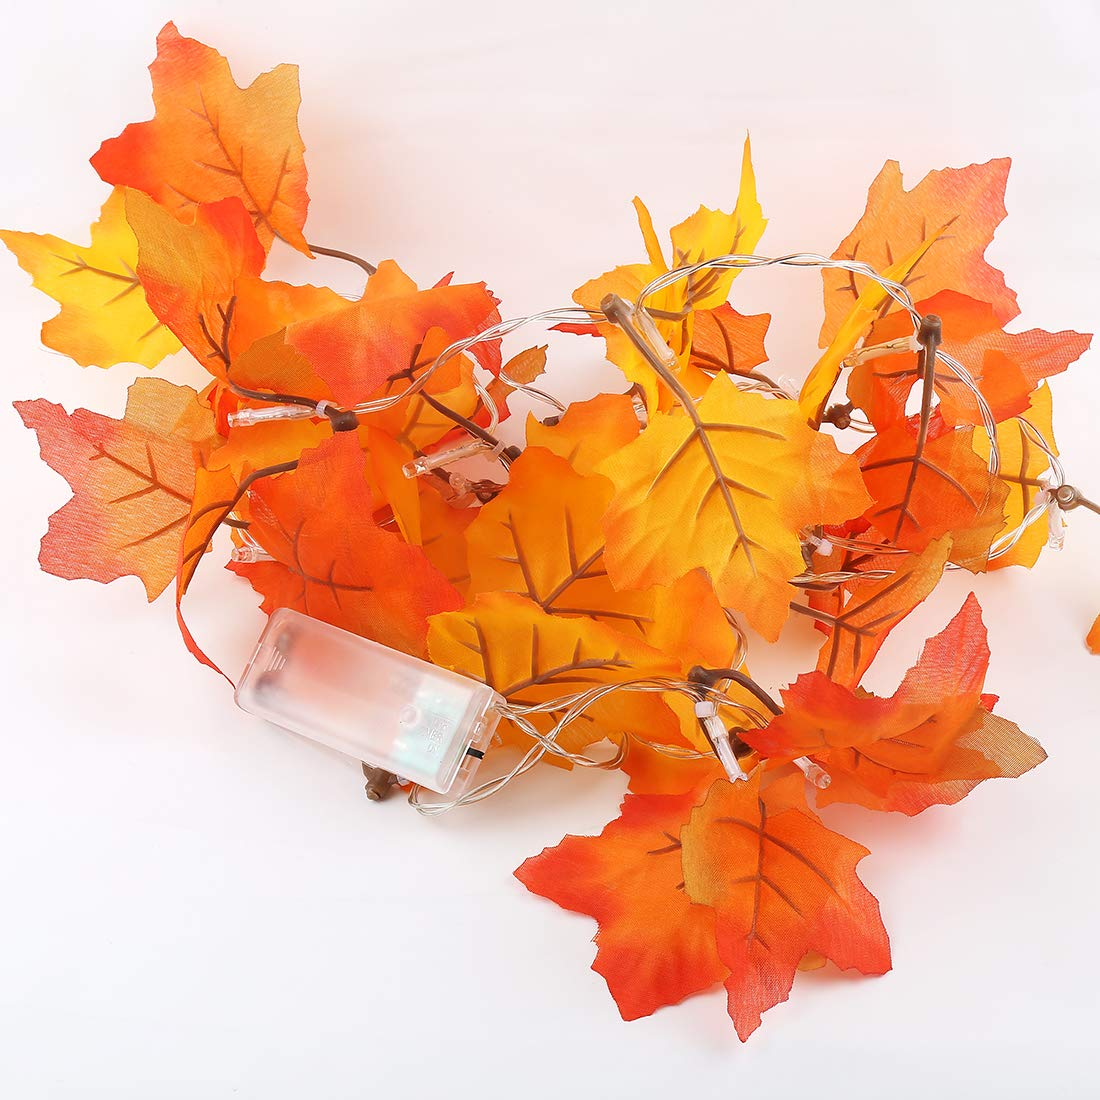 SILIVN Fall Decorations,Fall Garland,Fall Wreath,Thanksgiving Decorations,Christmas Decor Lighted Fall Garland | 8.2 Feet | 20 Lights (1 Pack)